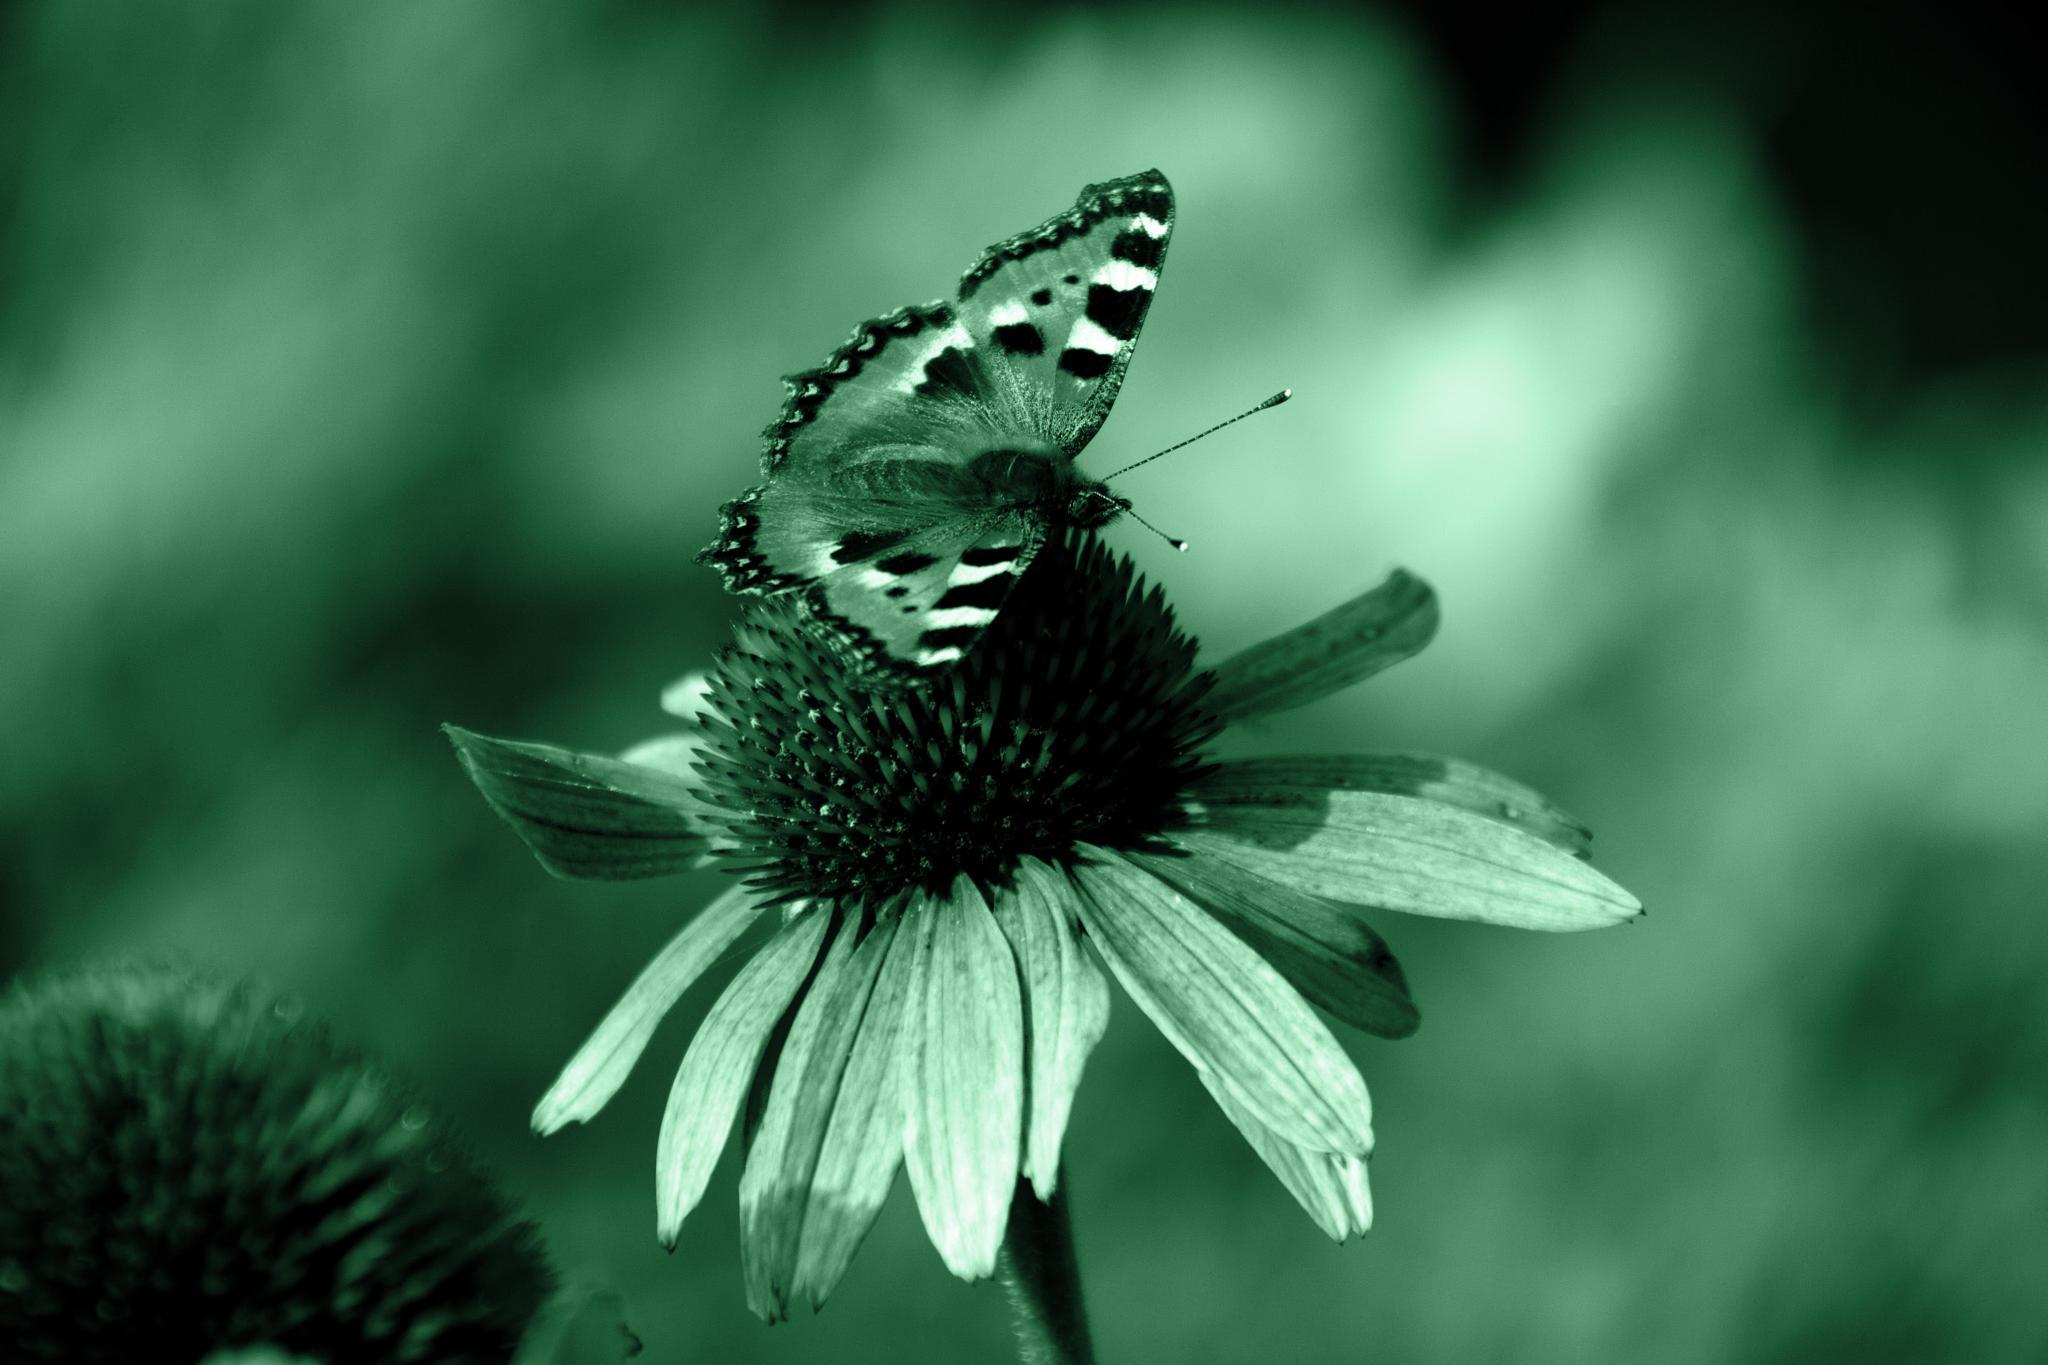 Butterfly by Kamila Šmídová